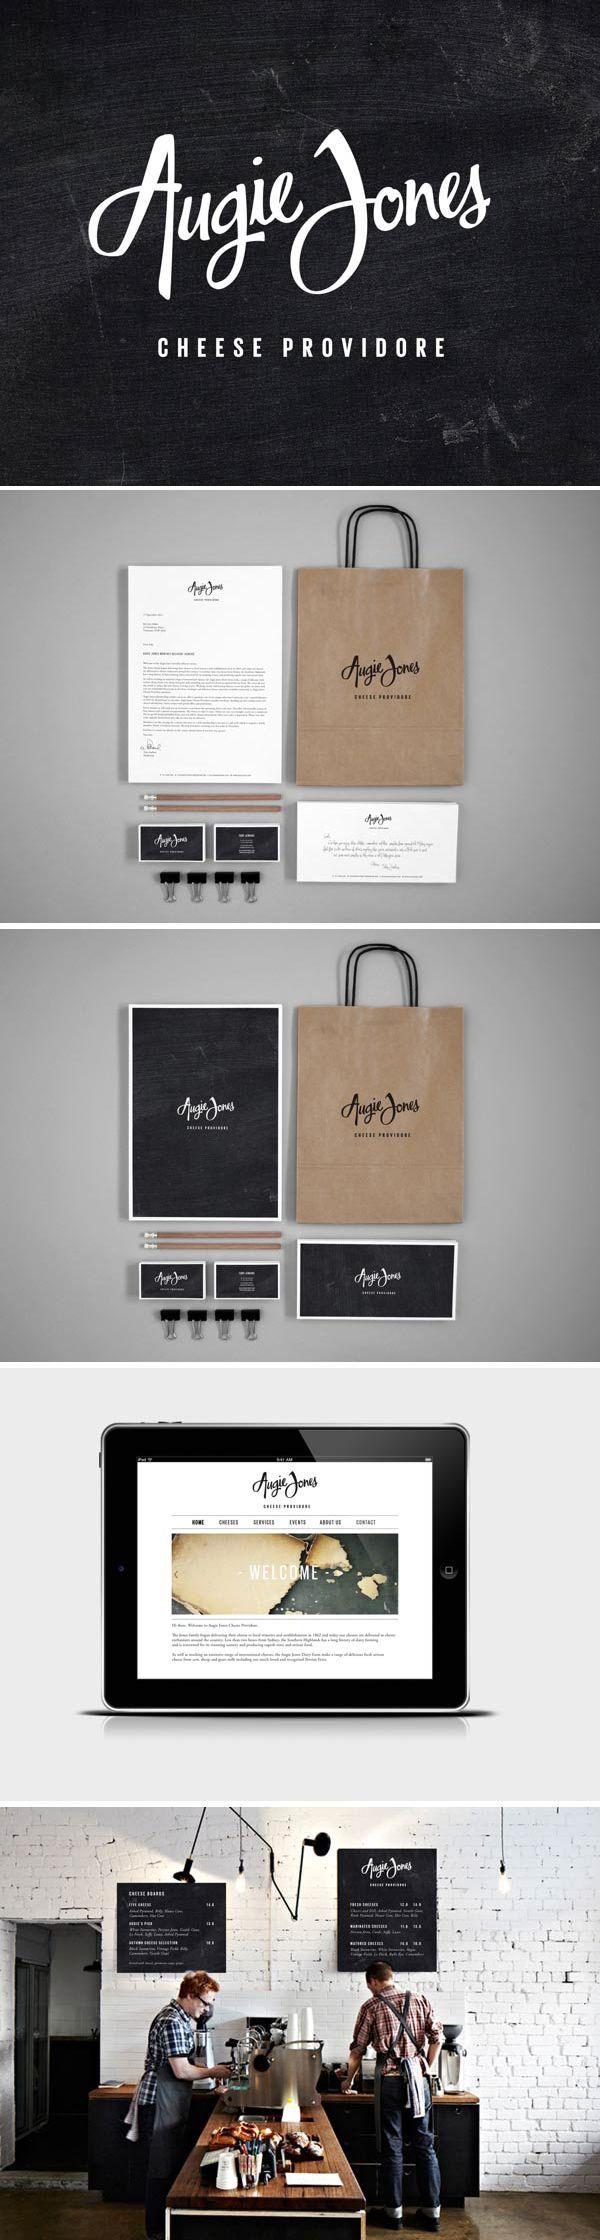 identity / Augie Jones - cheese   #stationary #corporate #design #corporatedesign #identity #branding #marketing < repinned by www.BlickeDeeler.de   Take a look at www.LogoGestaltung-Hamburg.de